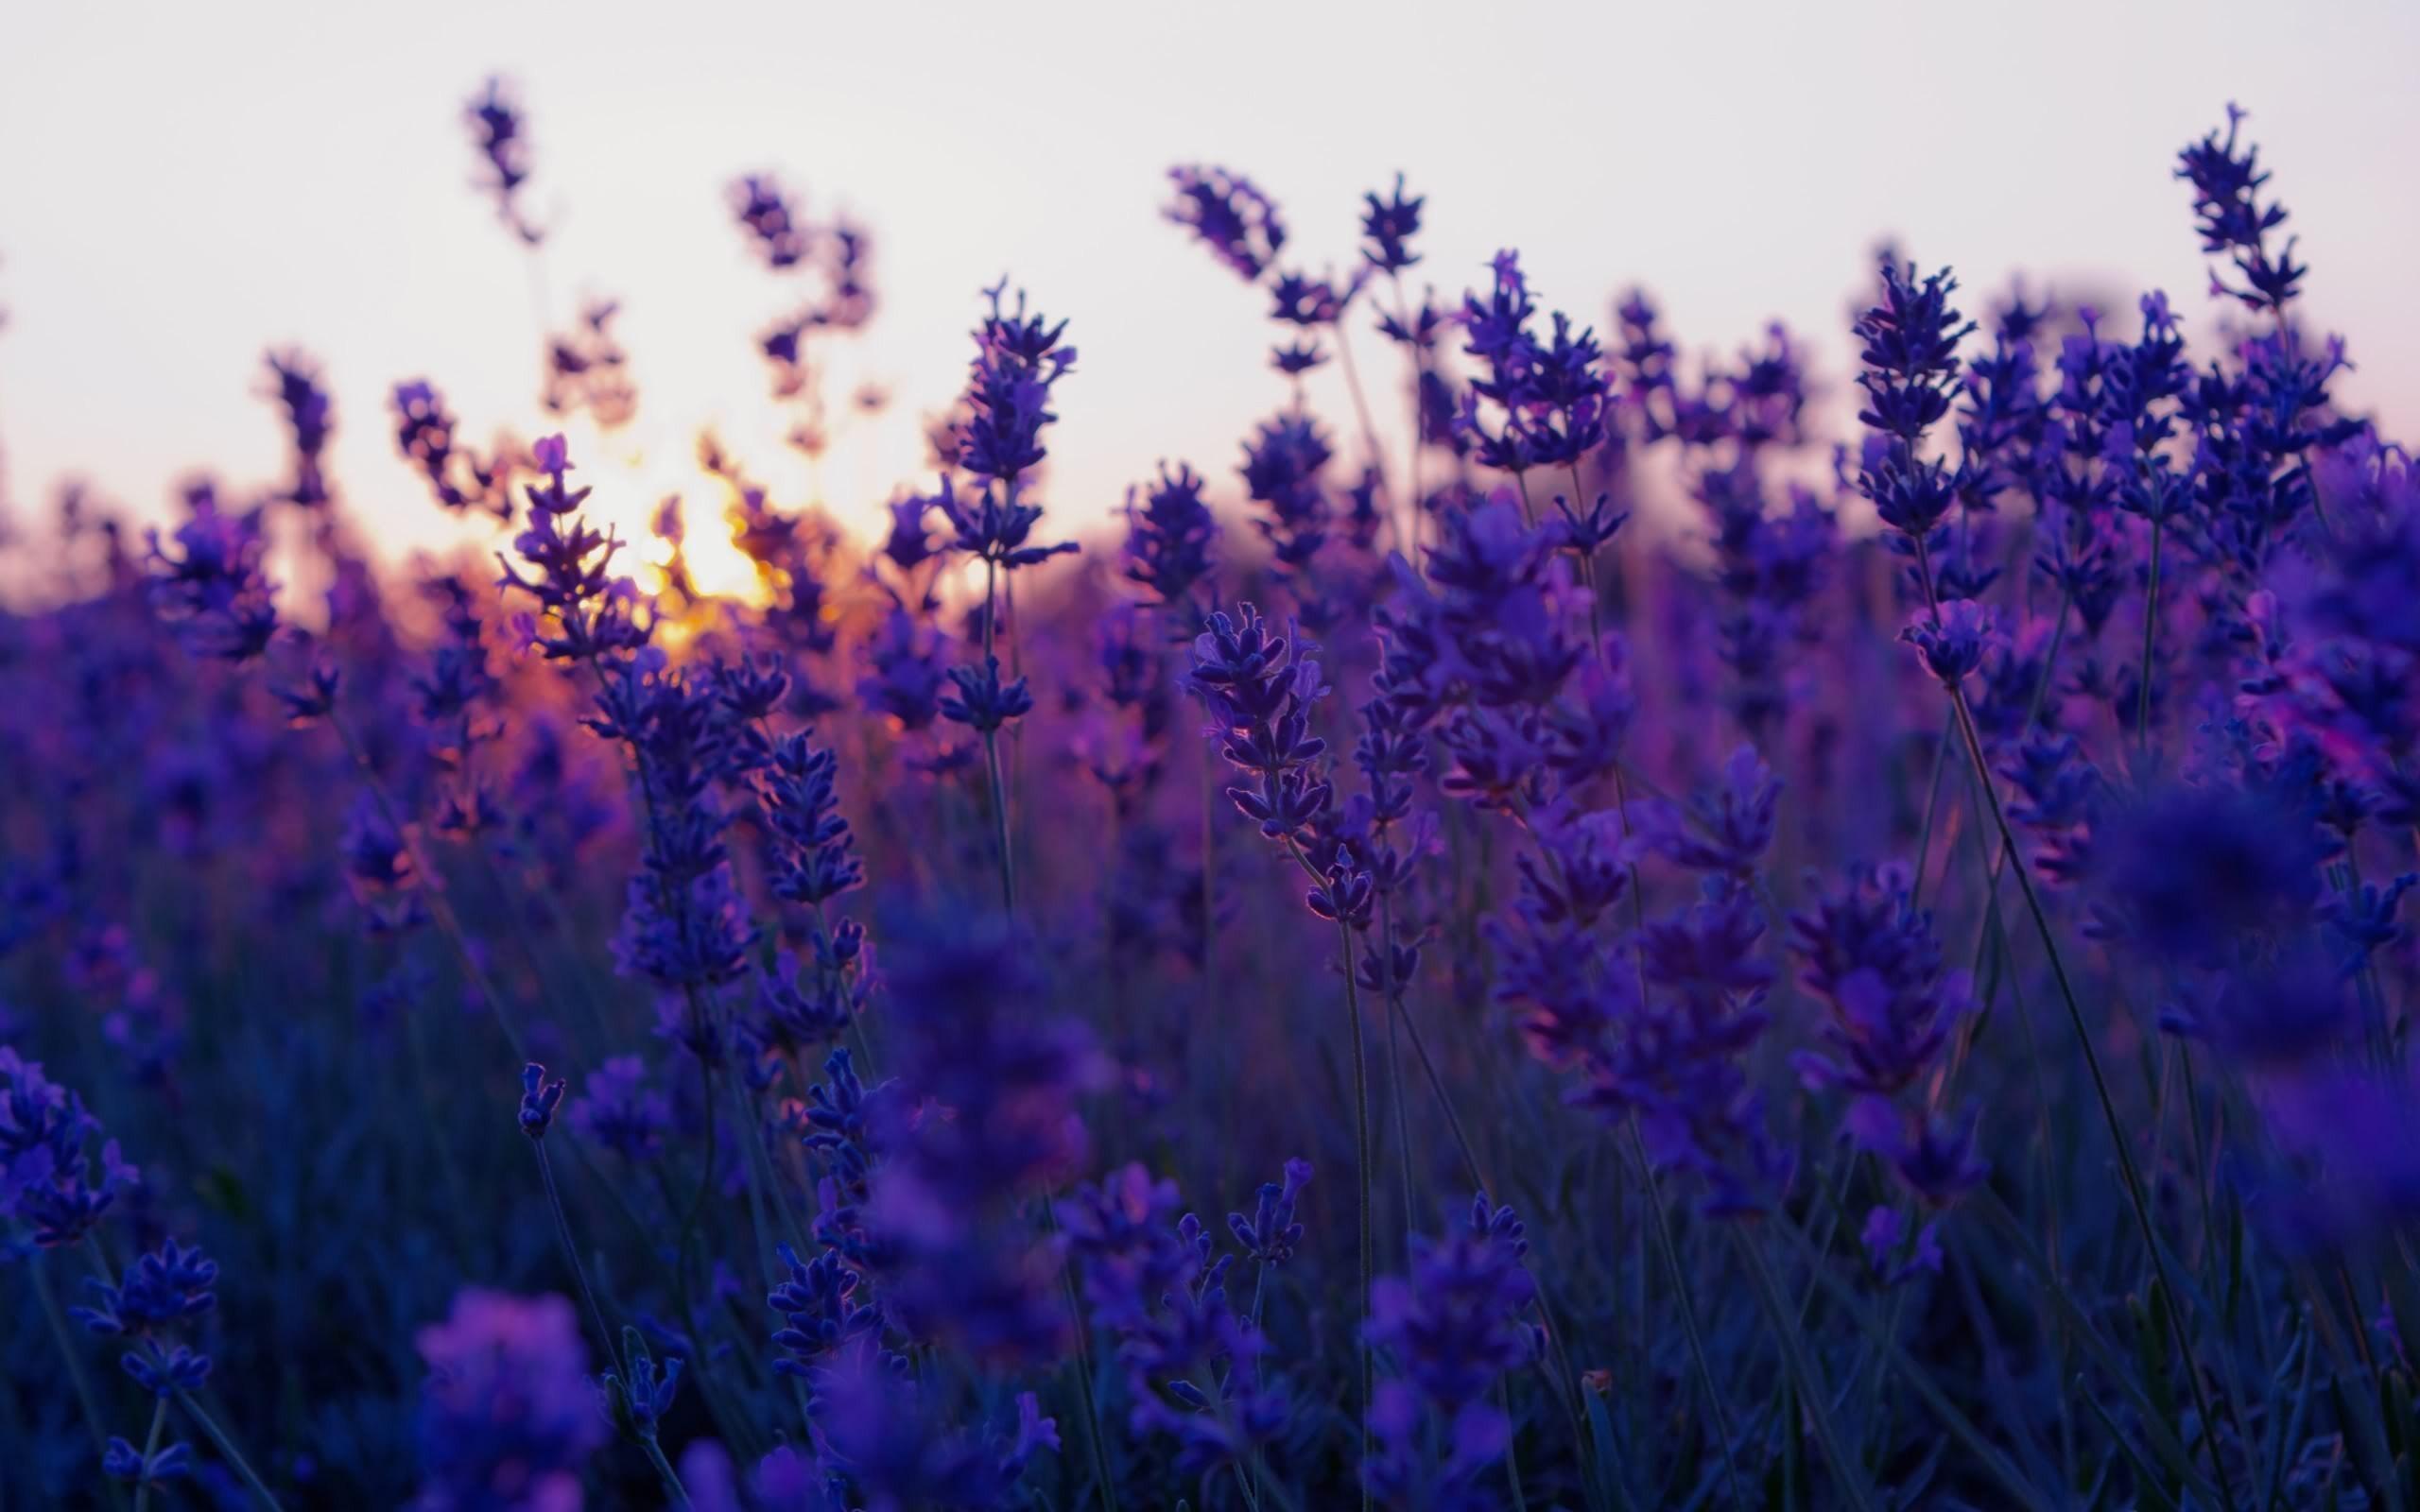 Field Lavender Purple Flowers Nature Photo